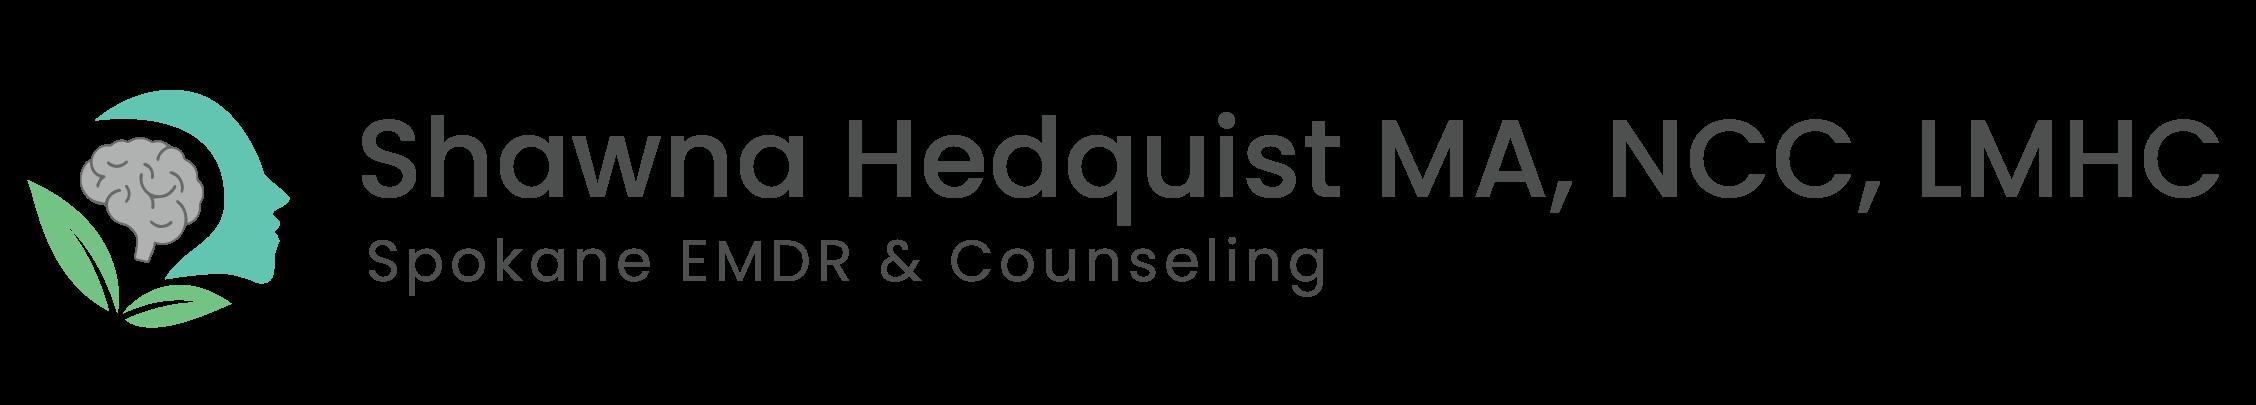 Spokane EMDR Counseling by Shawna Hedquist, MA, NCC, LMHC